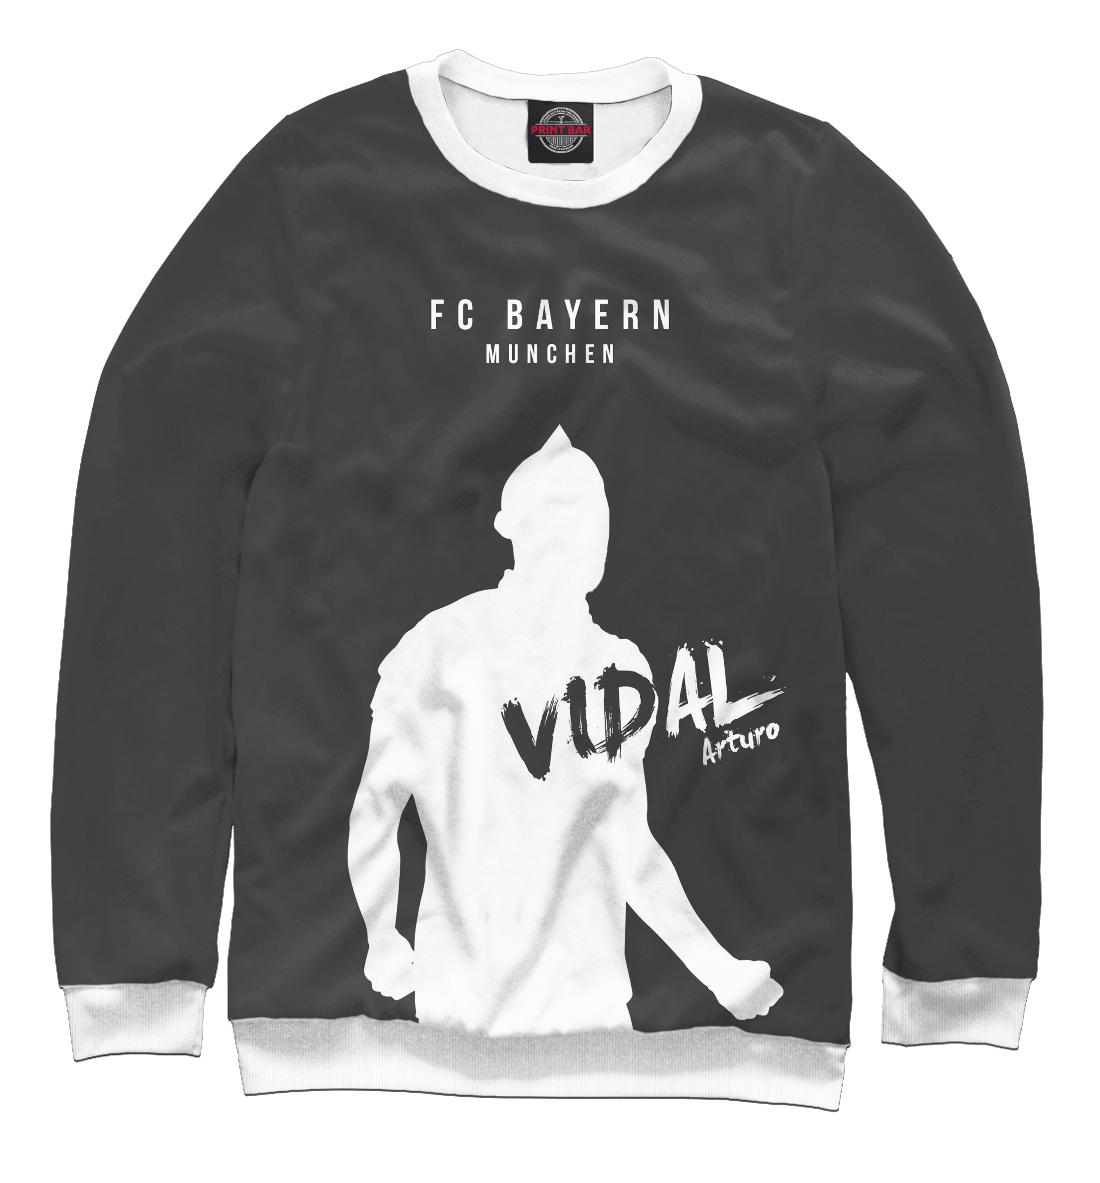 Купить Vidal, Printbar, Свитшоты, BAY-602526-swi-2